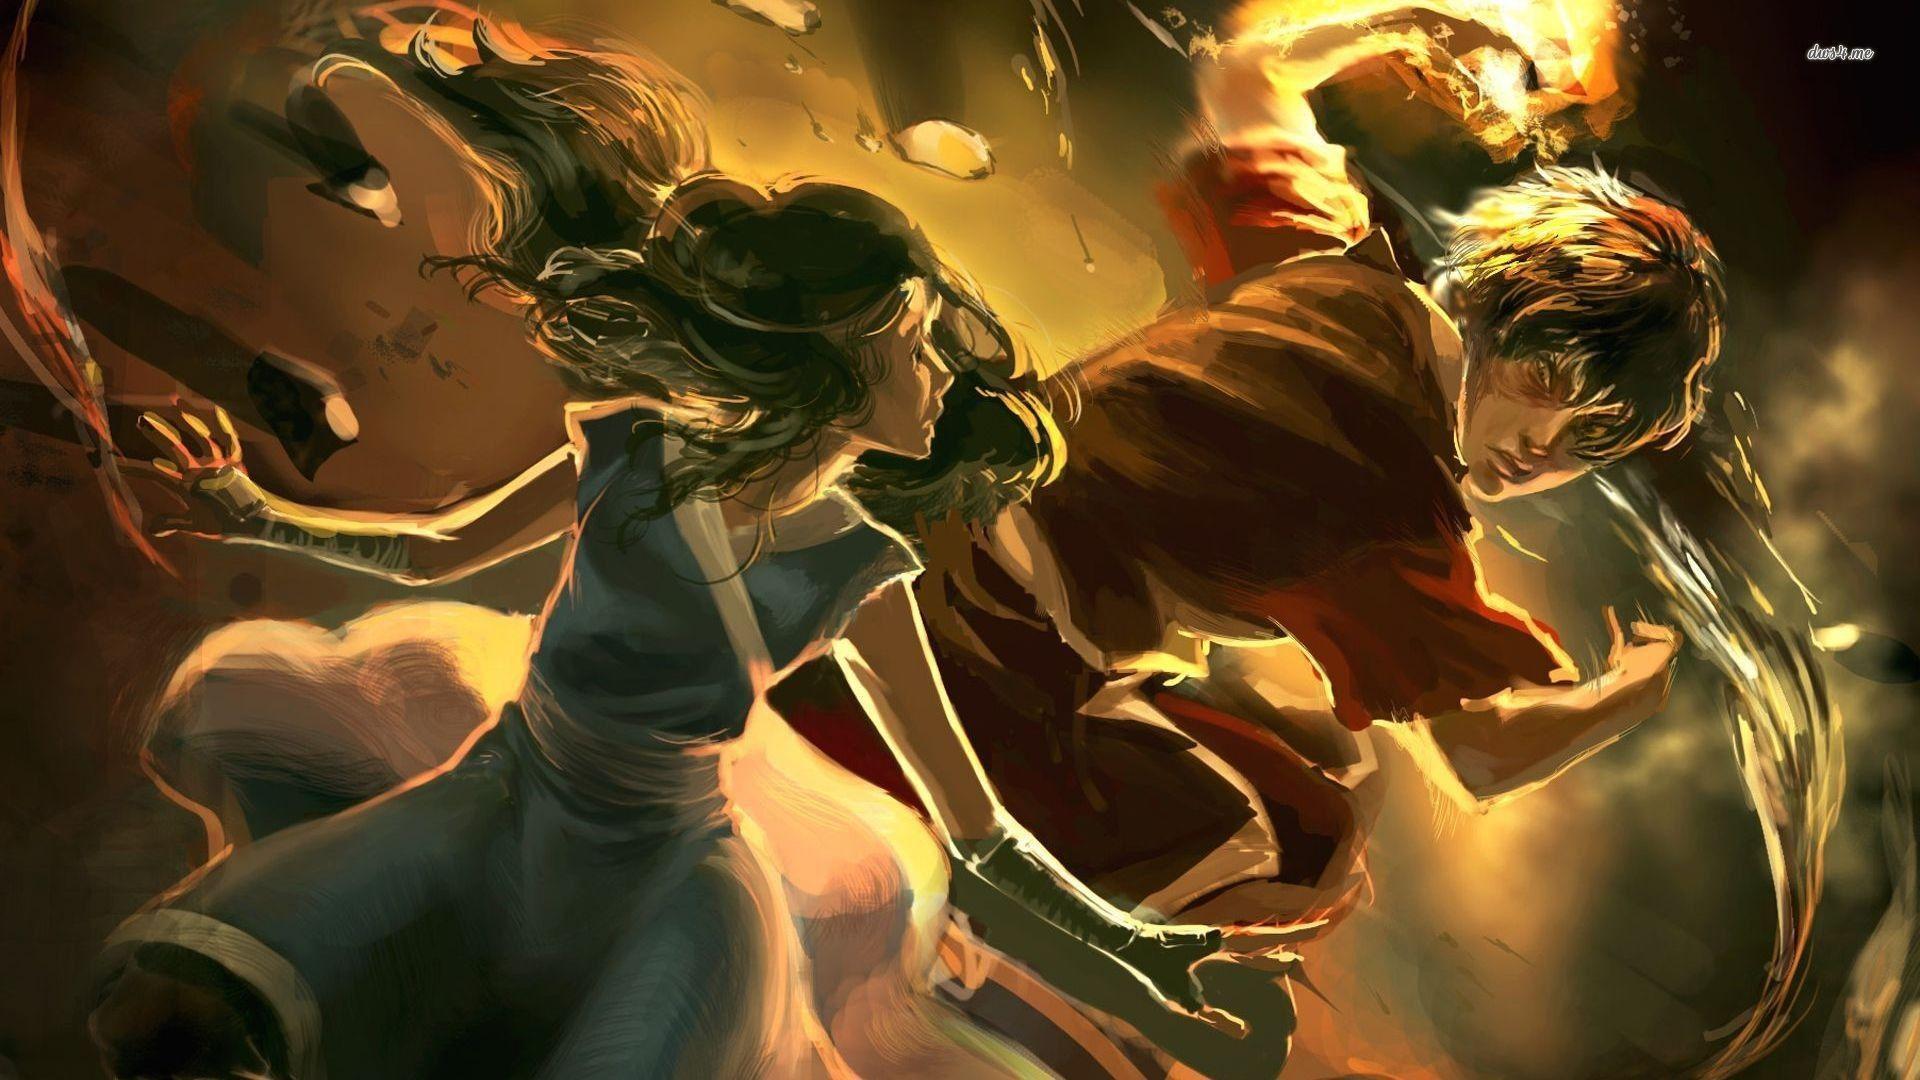 Aang Wallpapers Top Free Aang Backgrounds Wallpaperaccess